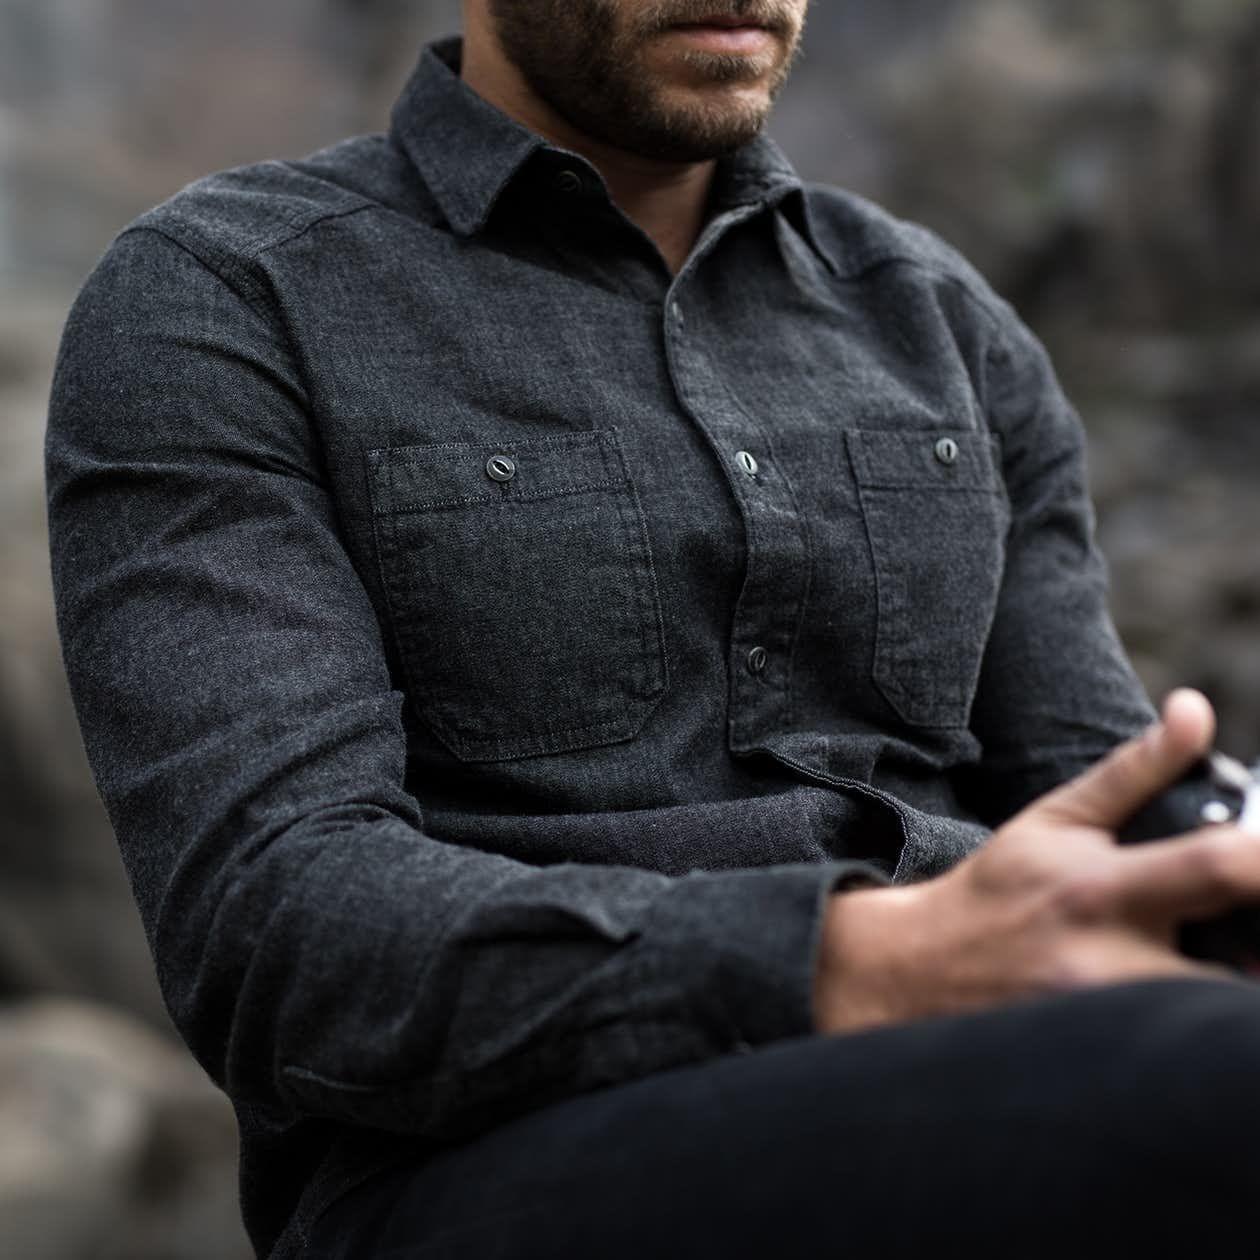 ShirtThings Work Crossback ShirtsShirts Wear To dCxeoB